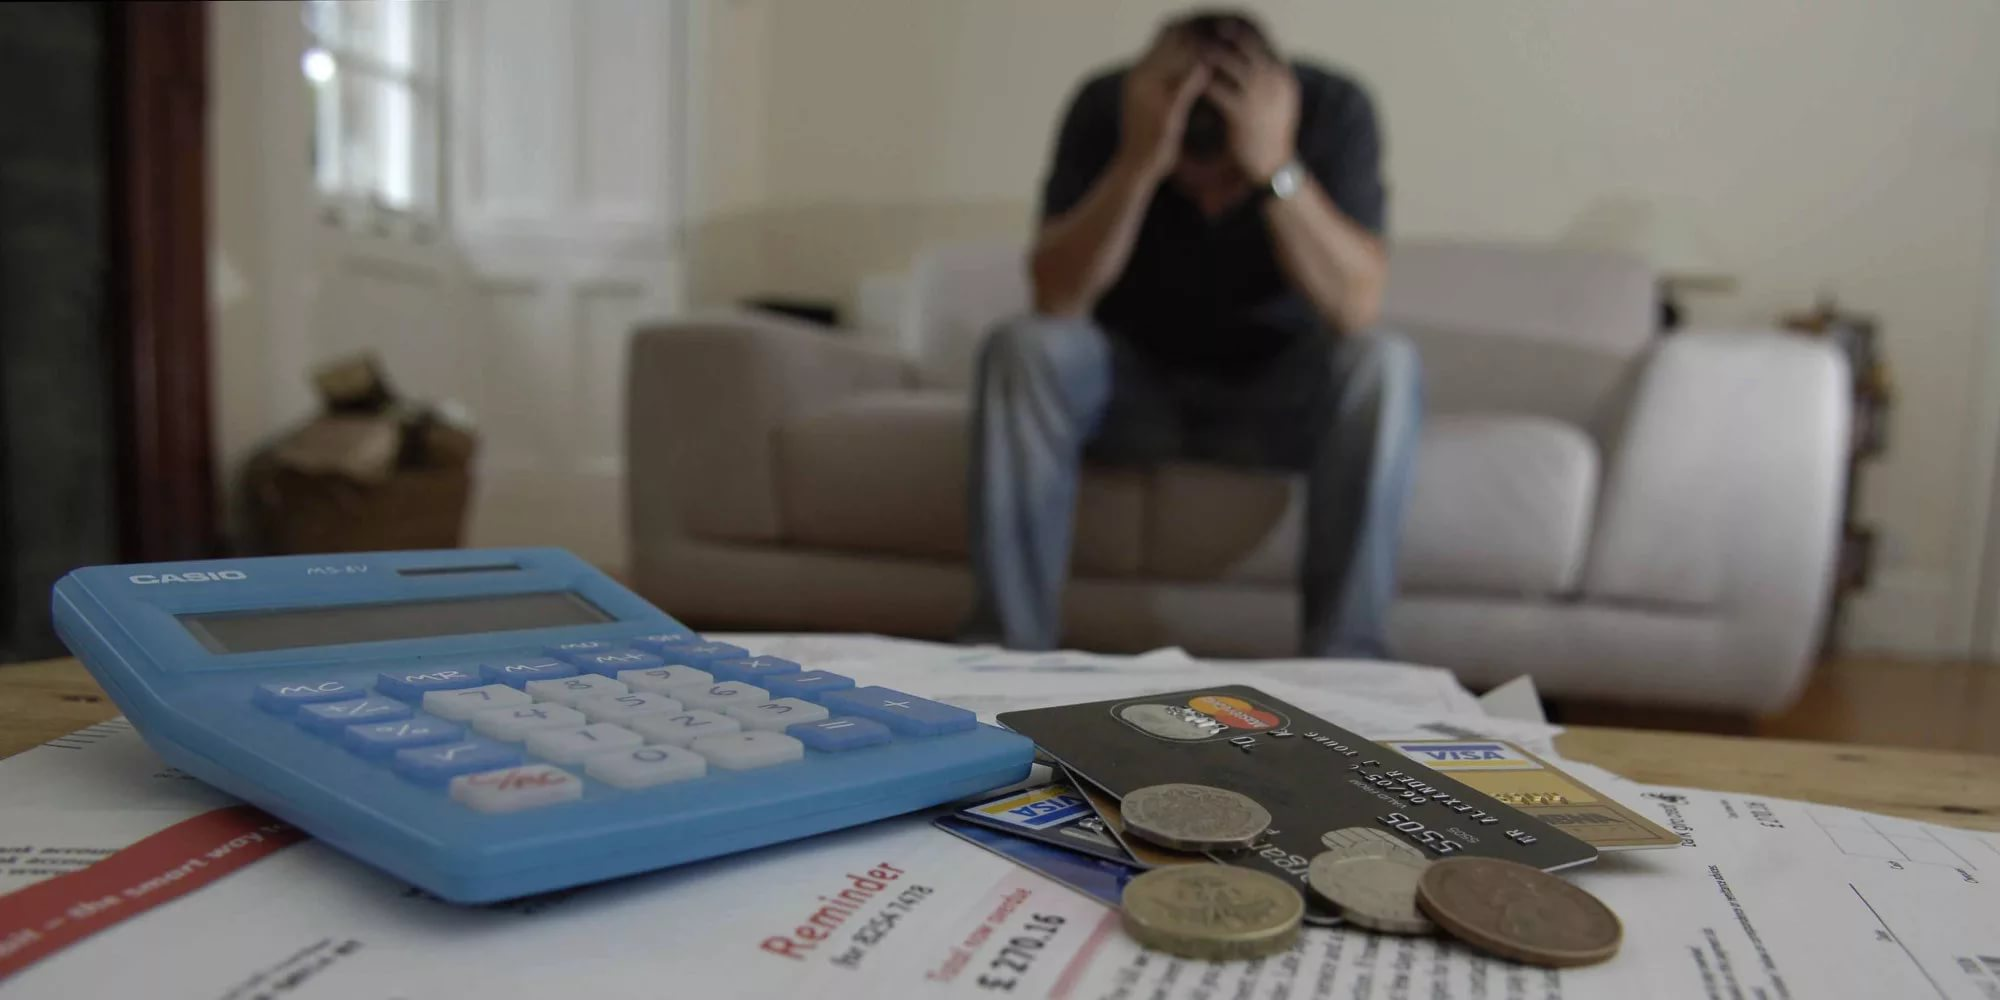 оставить заявку на кредит во все банки онлайн уфа